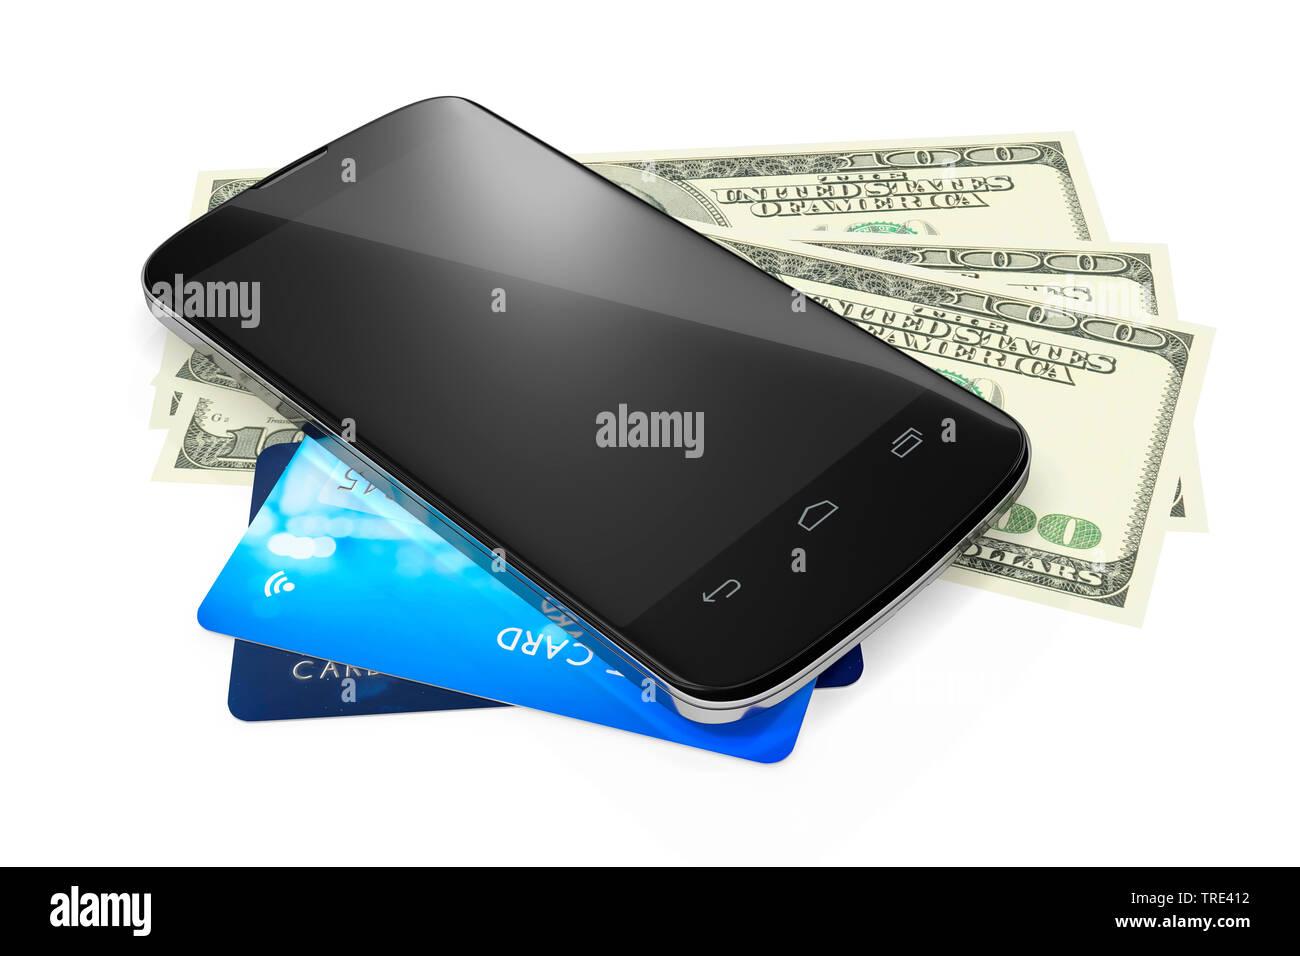 Mobiltelefon auf Kreditkarten und Bargeld liegend (Mobile Payment)   | Mobile phone lying on credit cards and cash money (mobile payment) | BLWS516675 - Stock Image